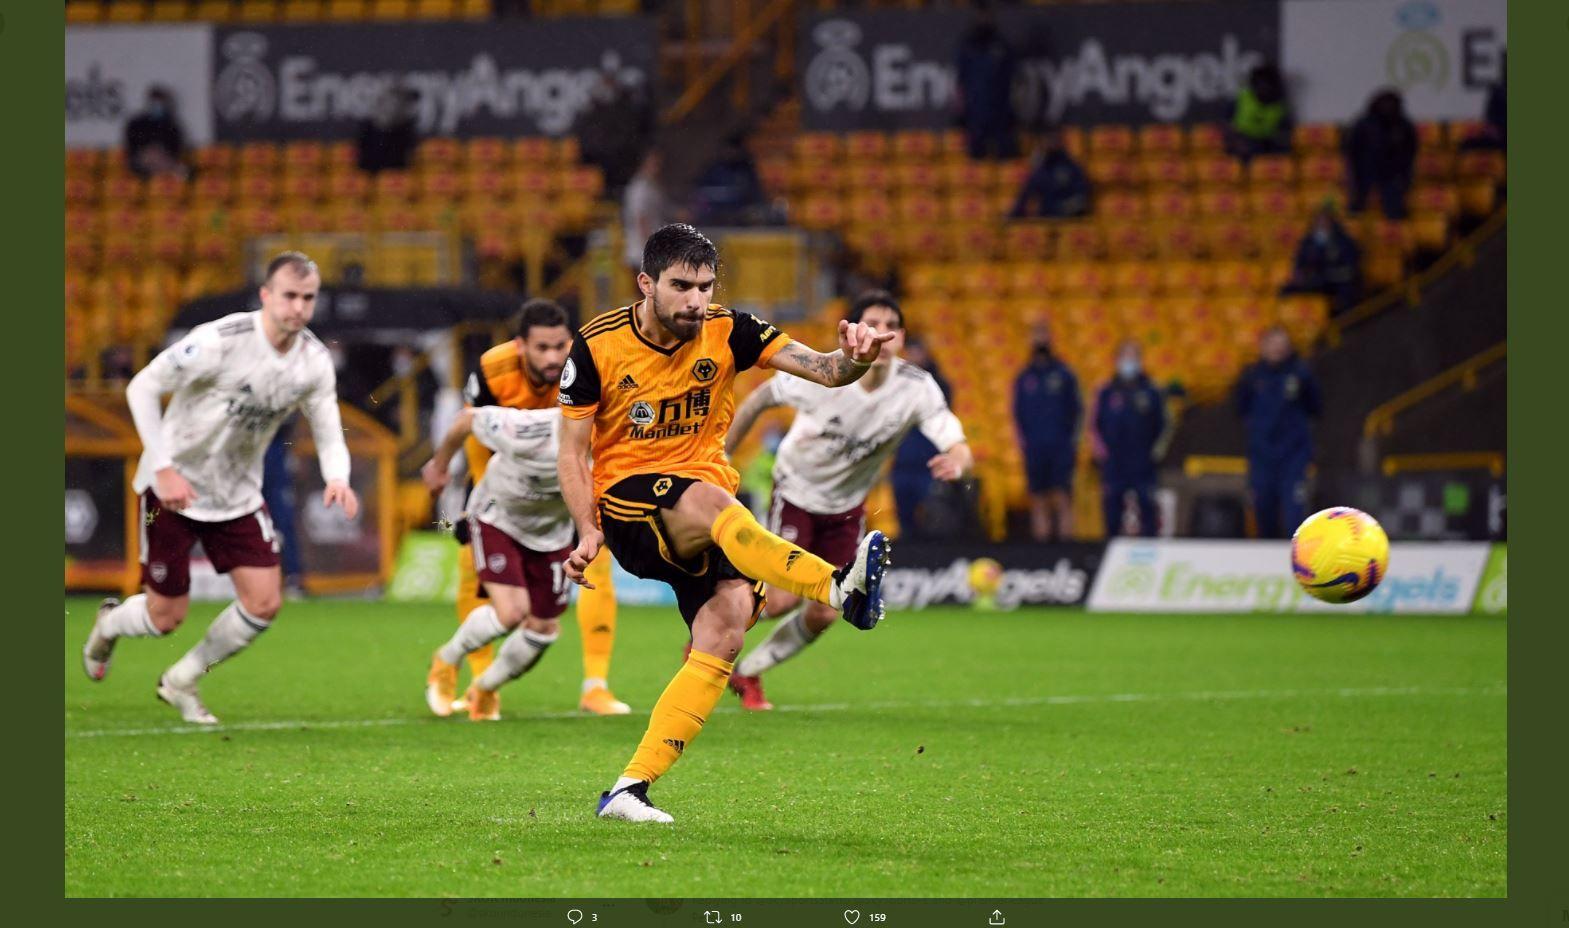 Pemain Wolverhampton Wanderers, Ruben Neves, mencetak gol ke gawang Arsenal, Rabu (3/2/2021) dini hari WIB.